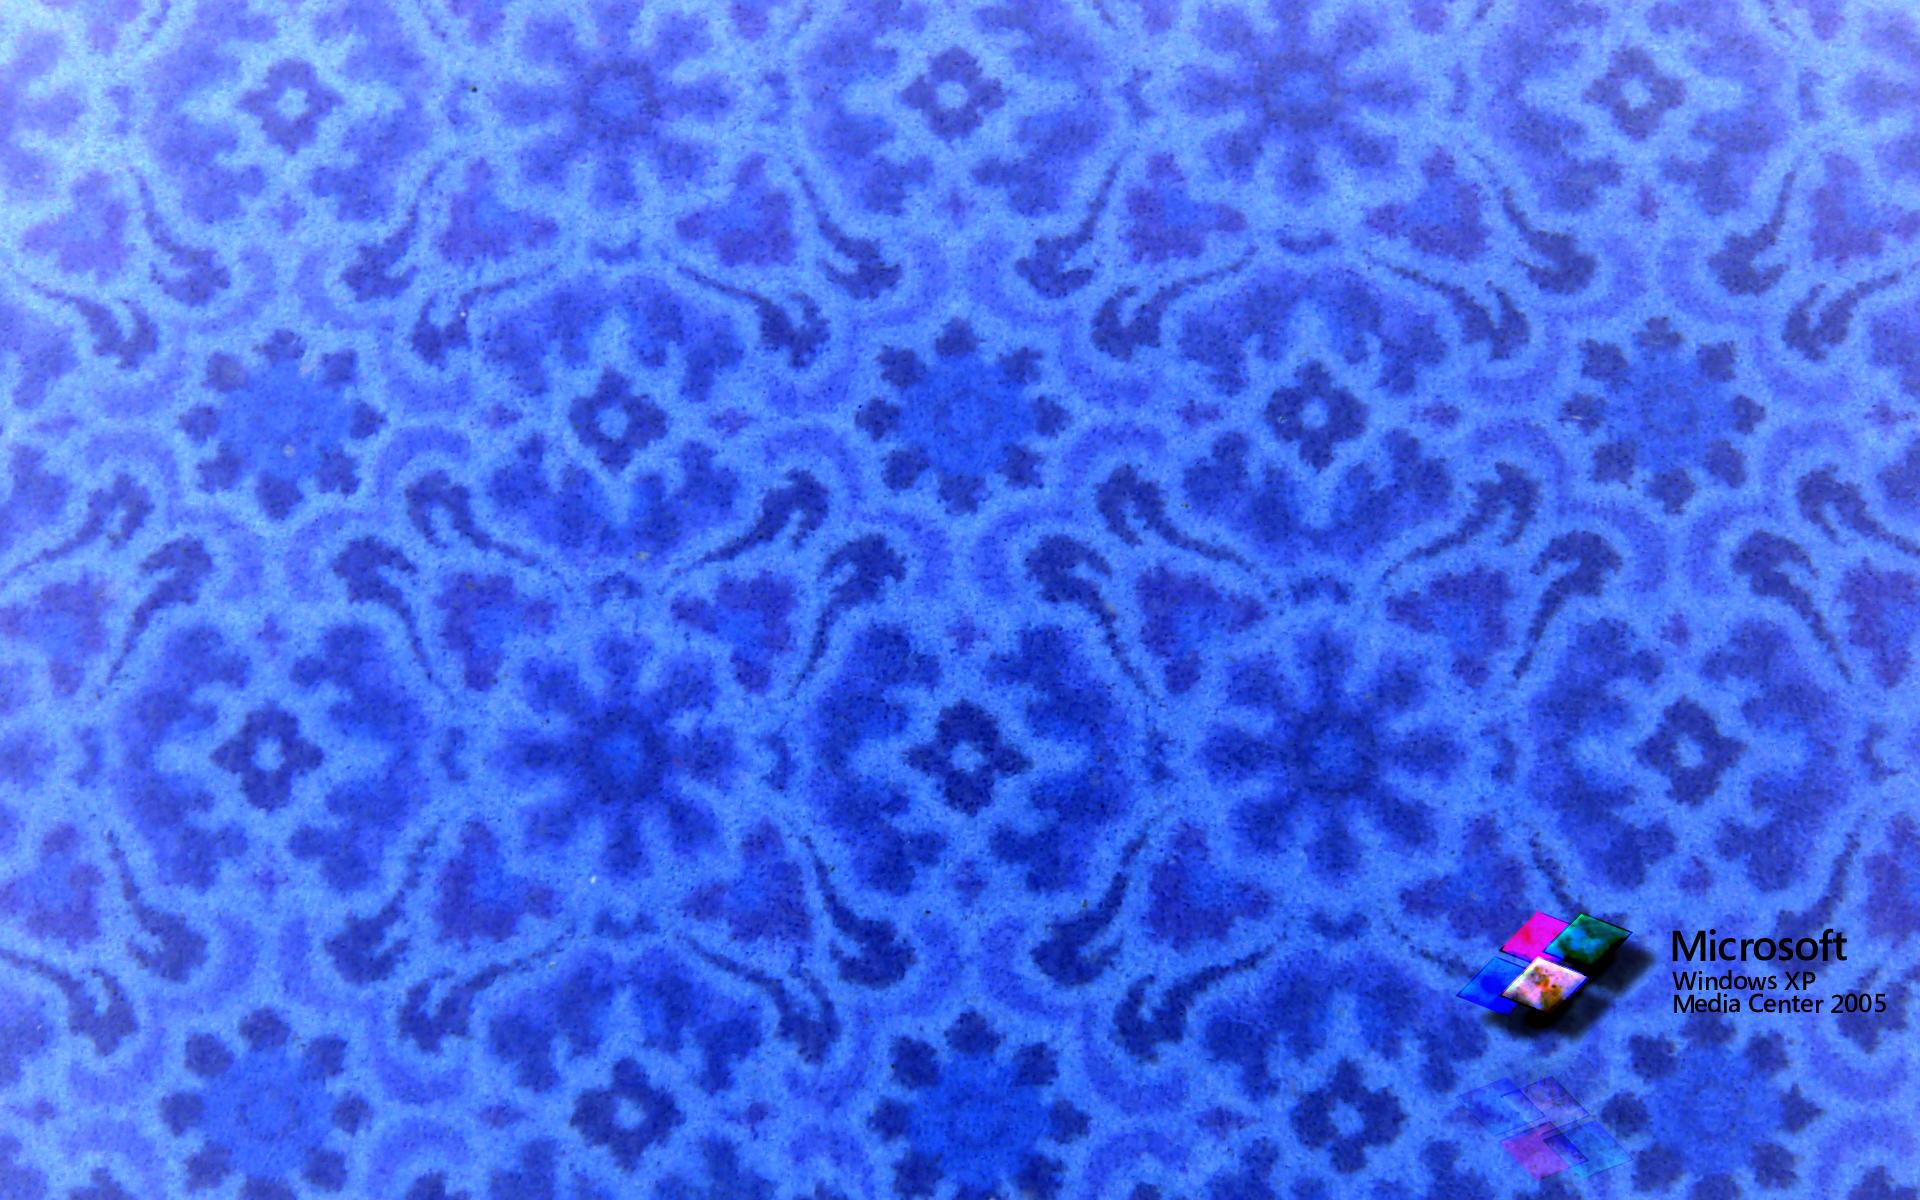 Blue carpet designs mce2005 by jimmyselix on deviantart for Blue carpets designs